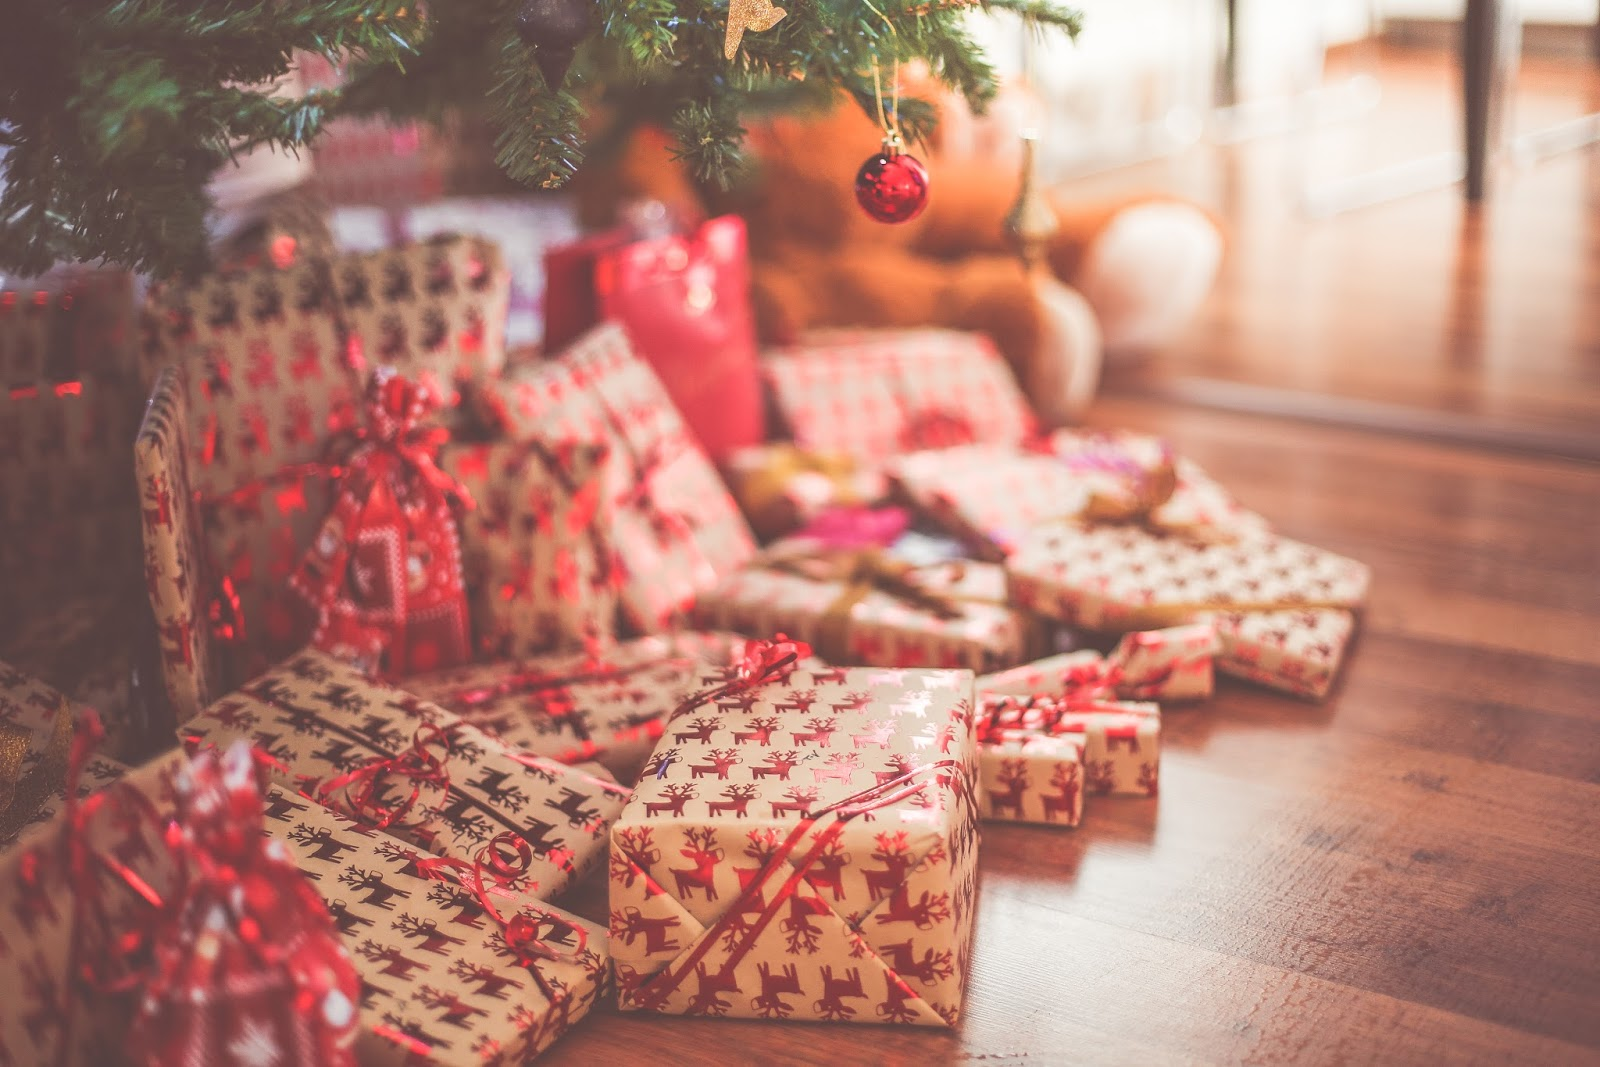 25 Reasons Why I Love Christmas